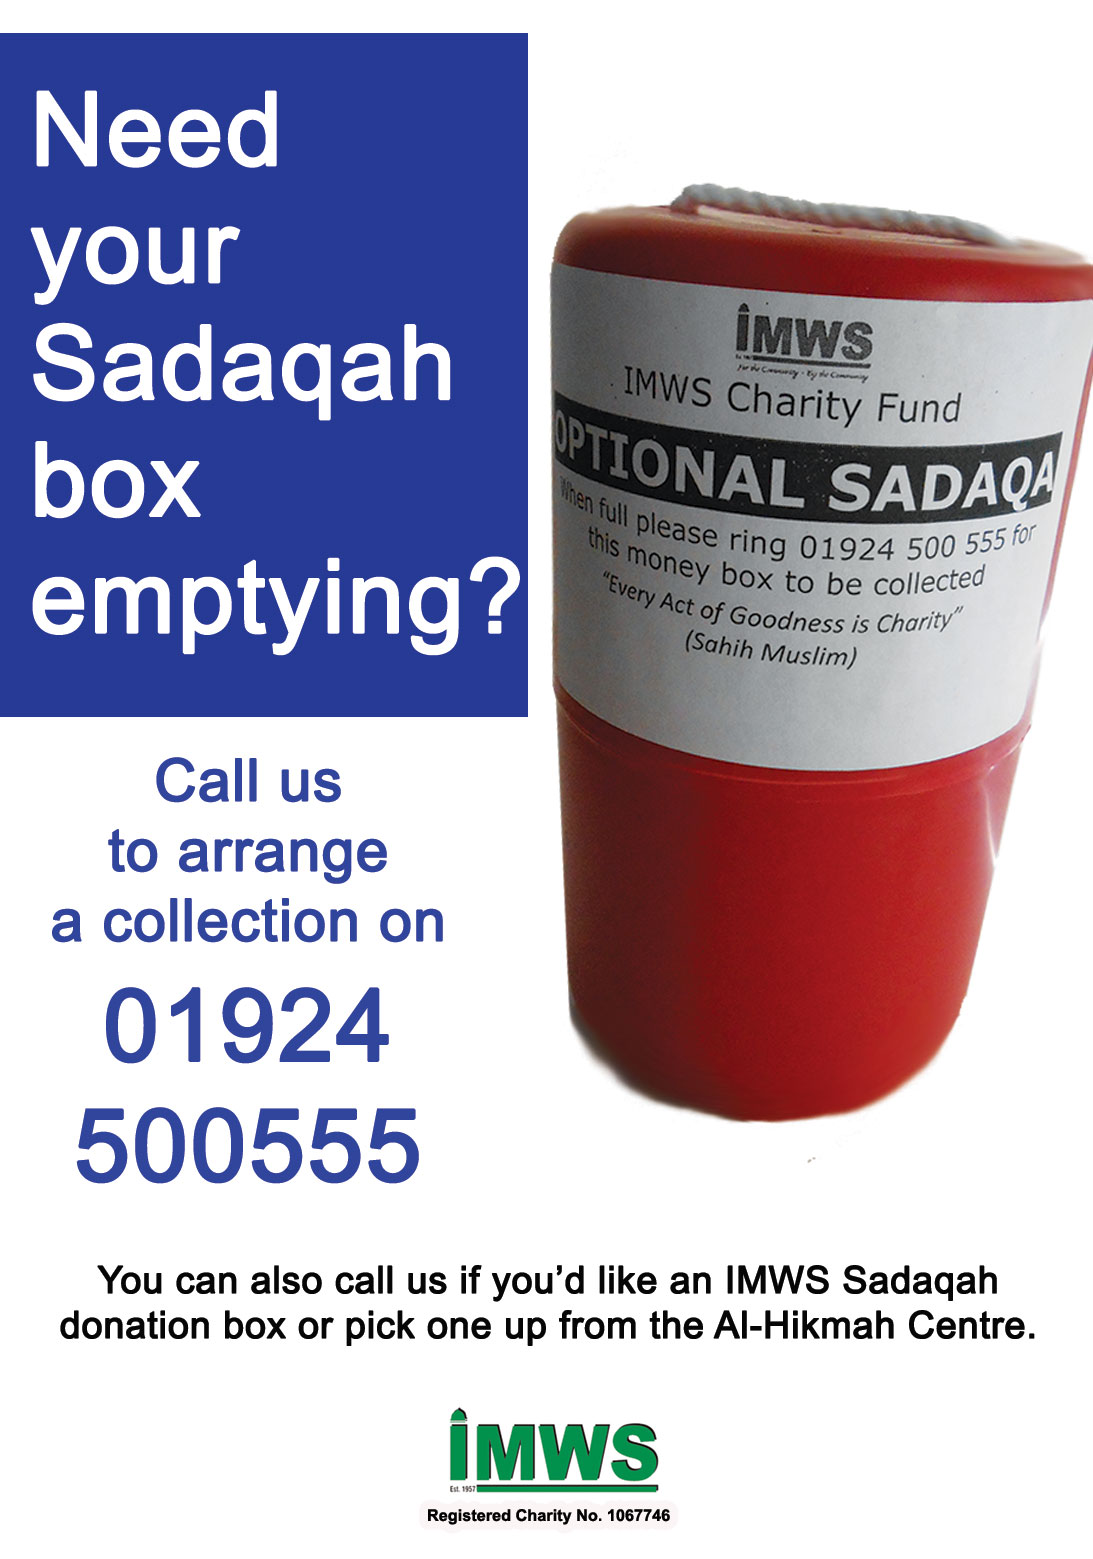 Sadaqa box collection service